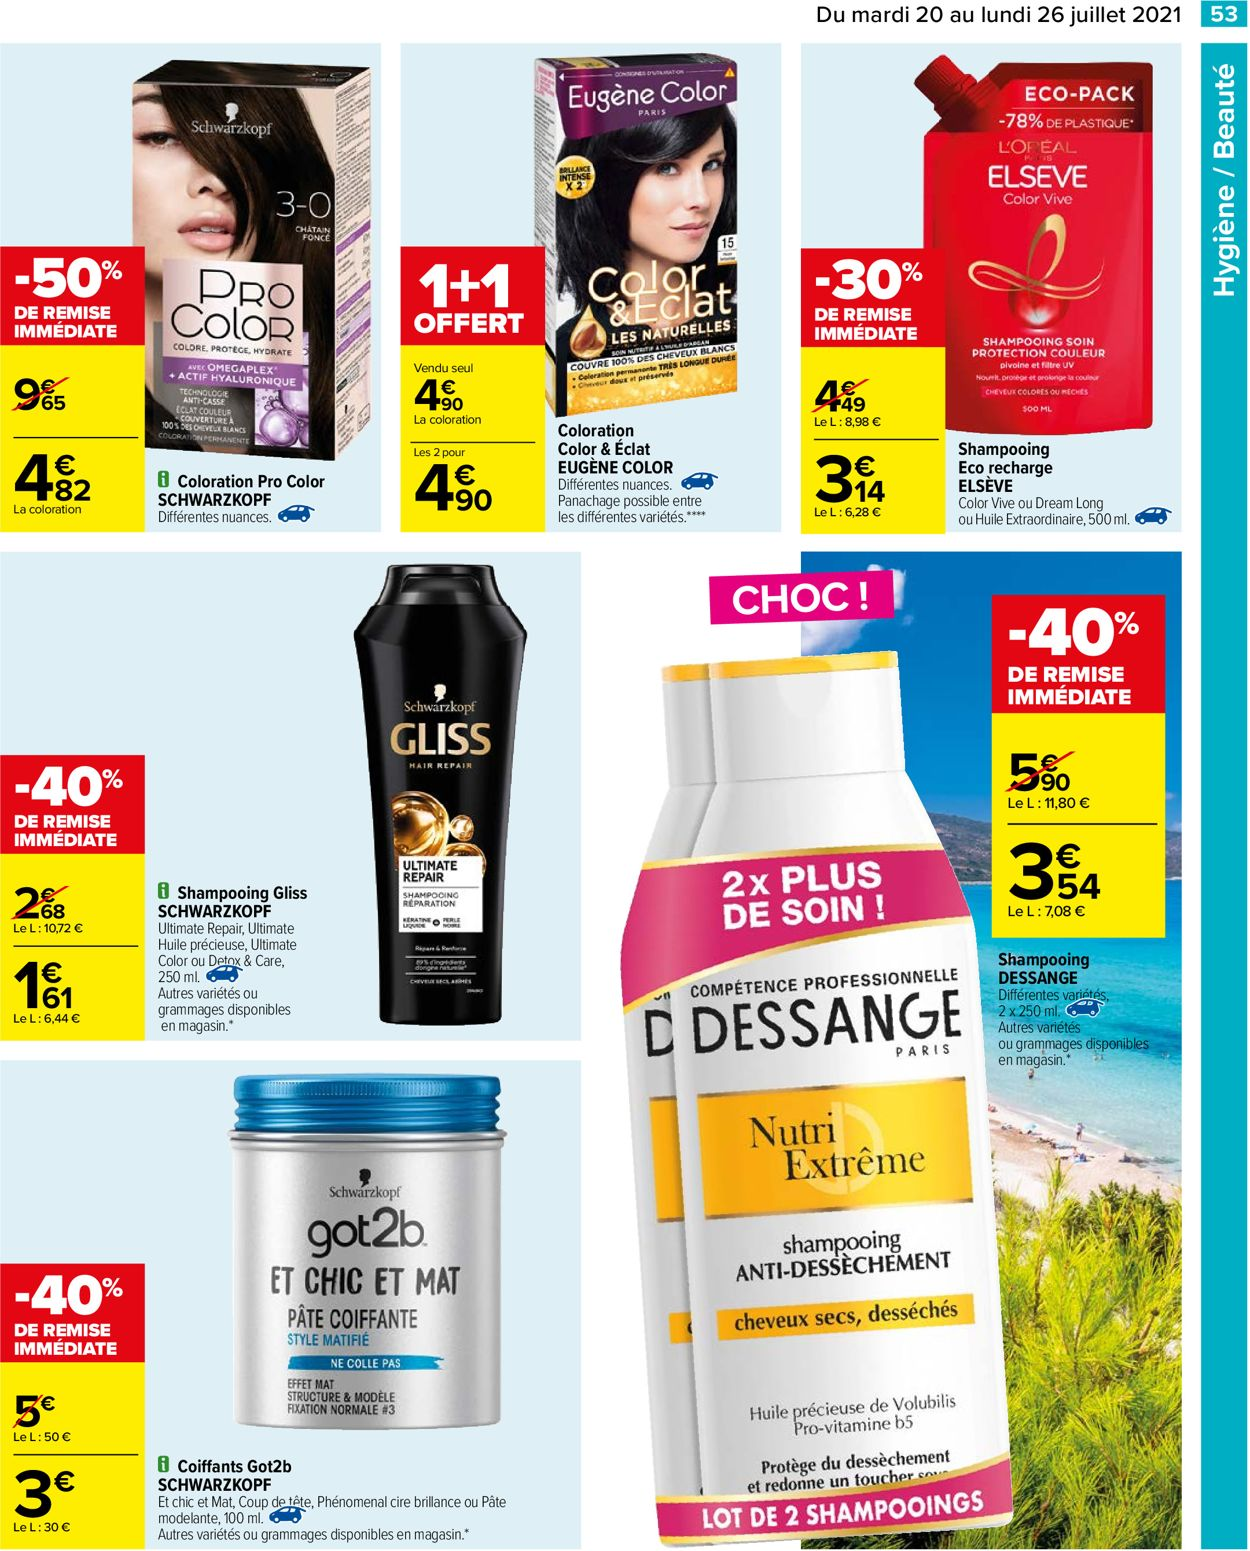 Carrefour Catalogue - 20.07-26.07.2021 (Page 57)